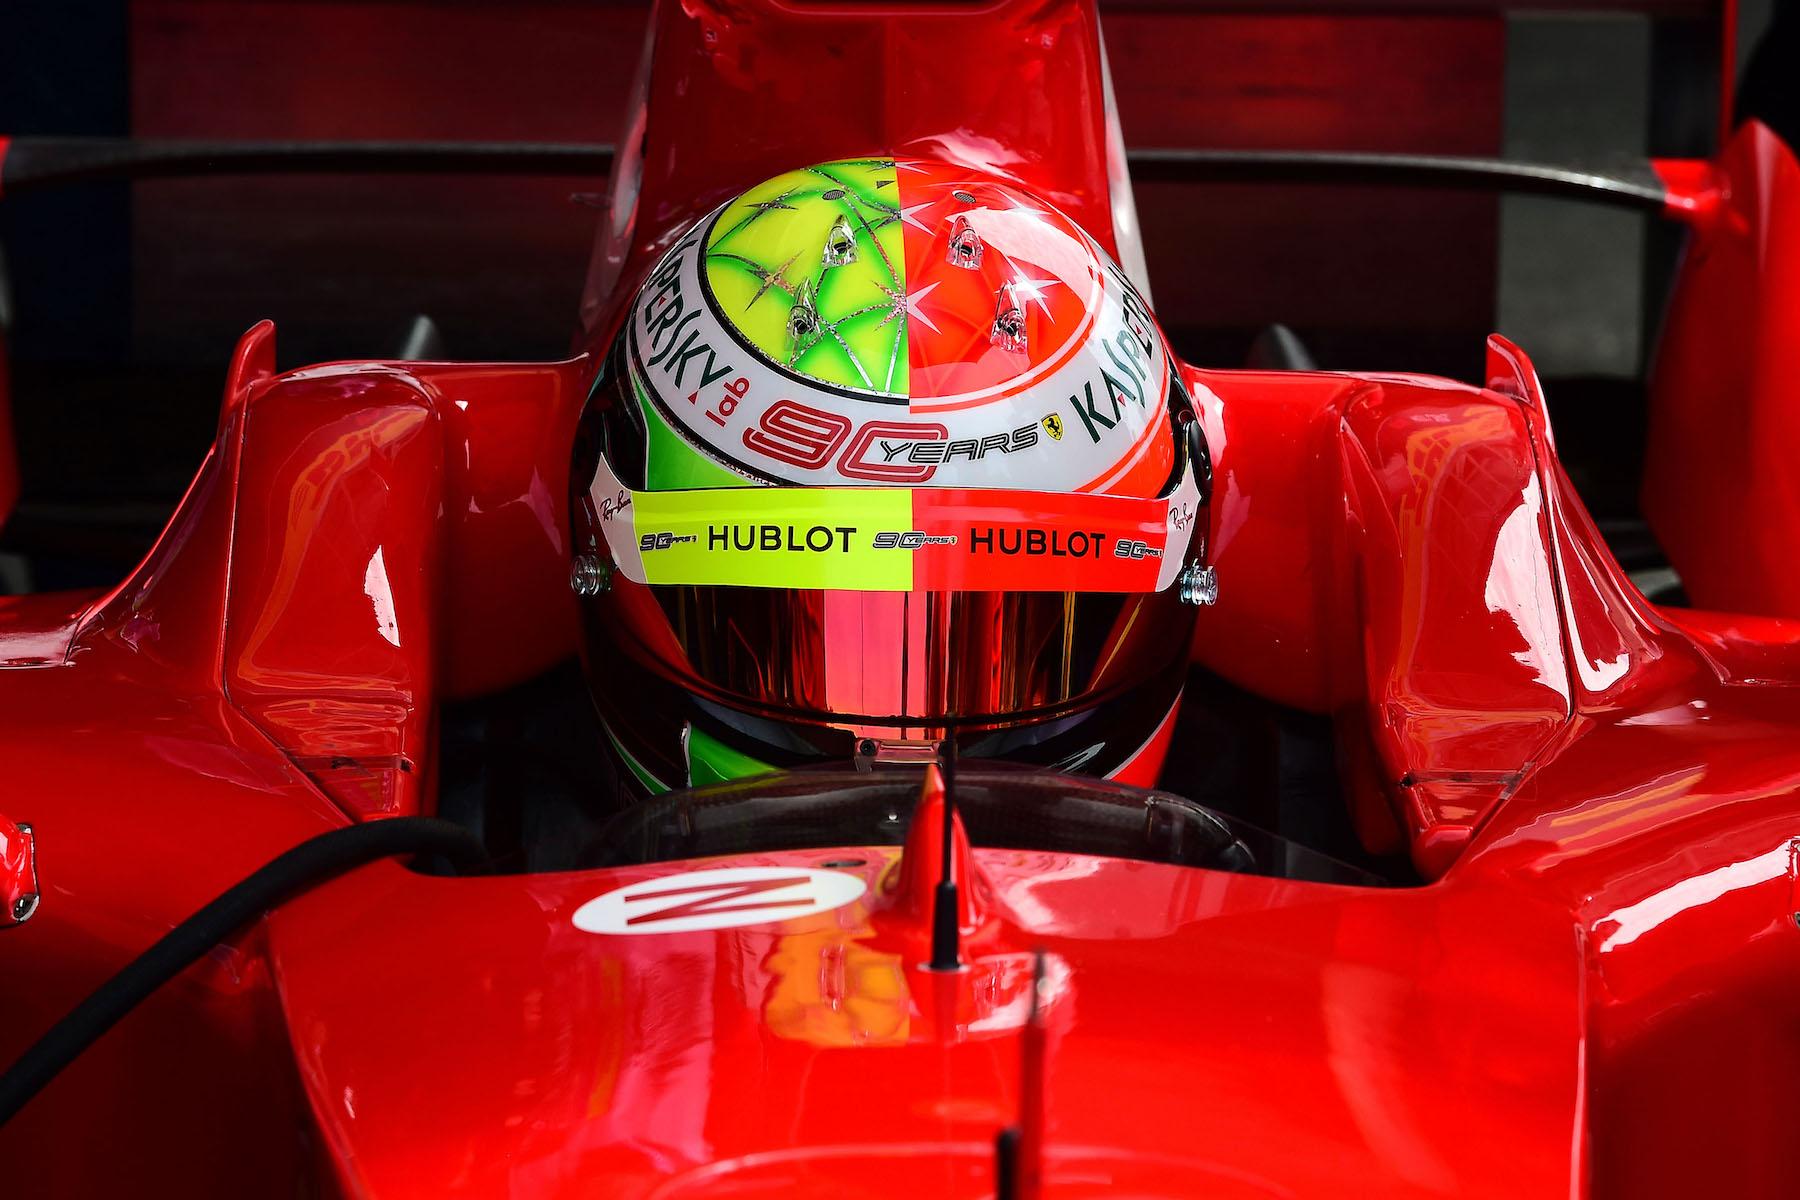 2019 Mick Schumacher | Ferrari F2004 | 2019 German GP 2 copy.jpg